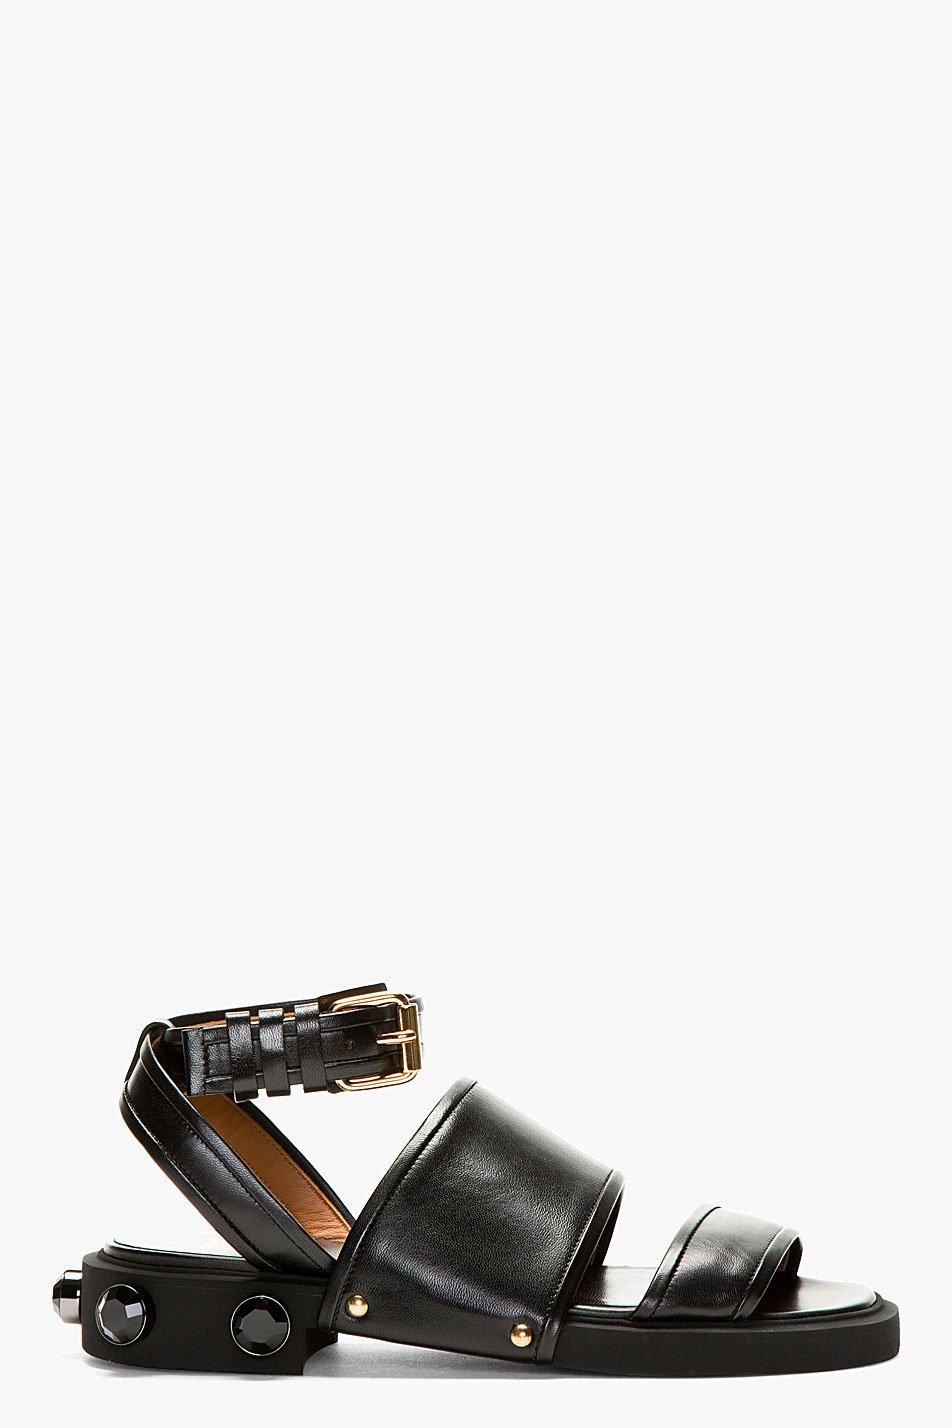 Givenchy black nappa leather jewel stud sandals